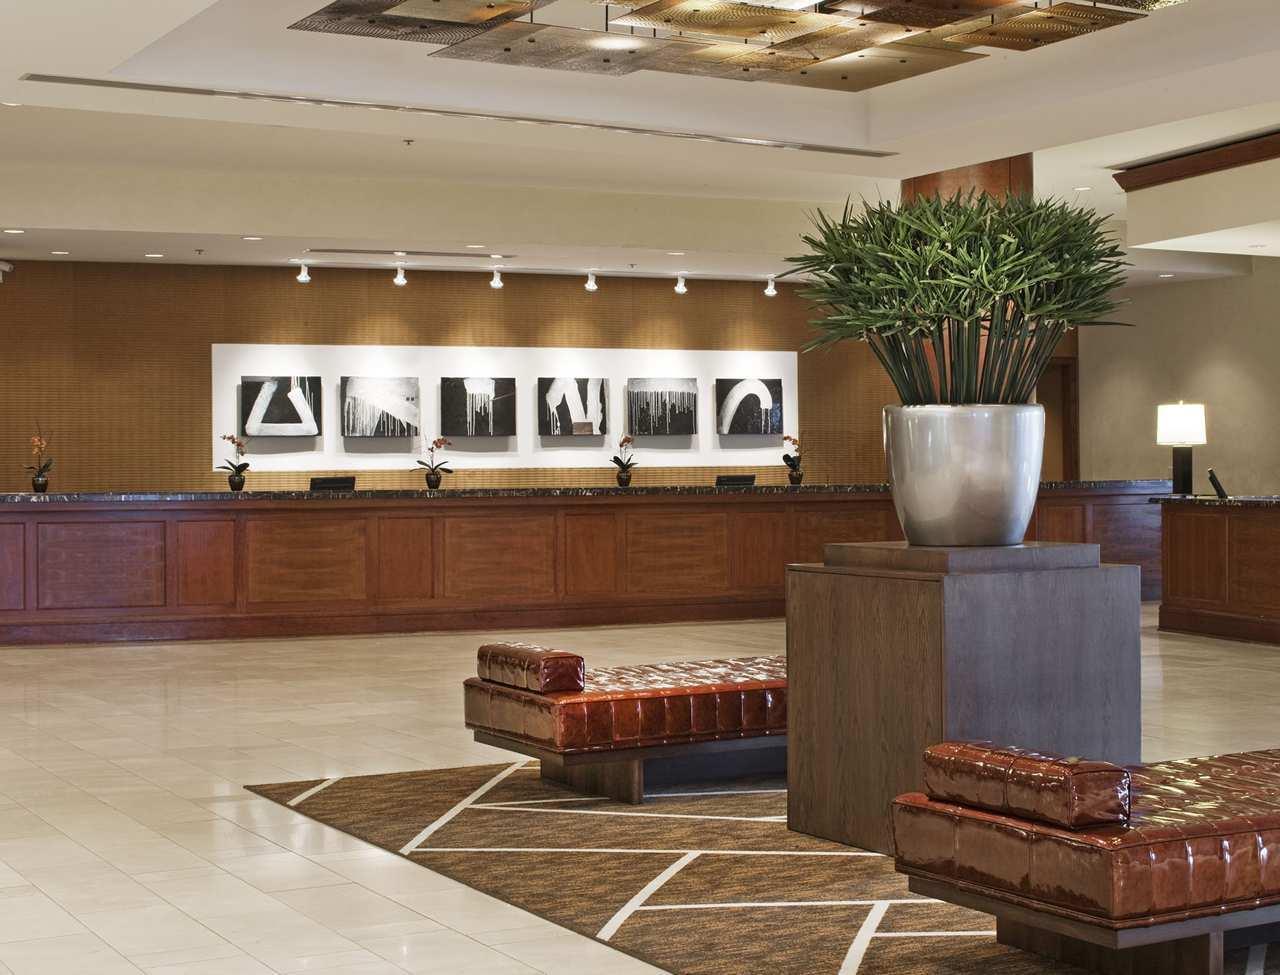 Hilton Omaha image 1